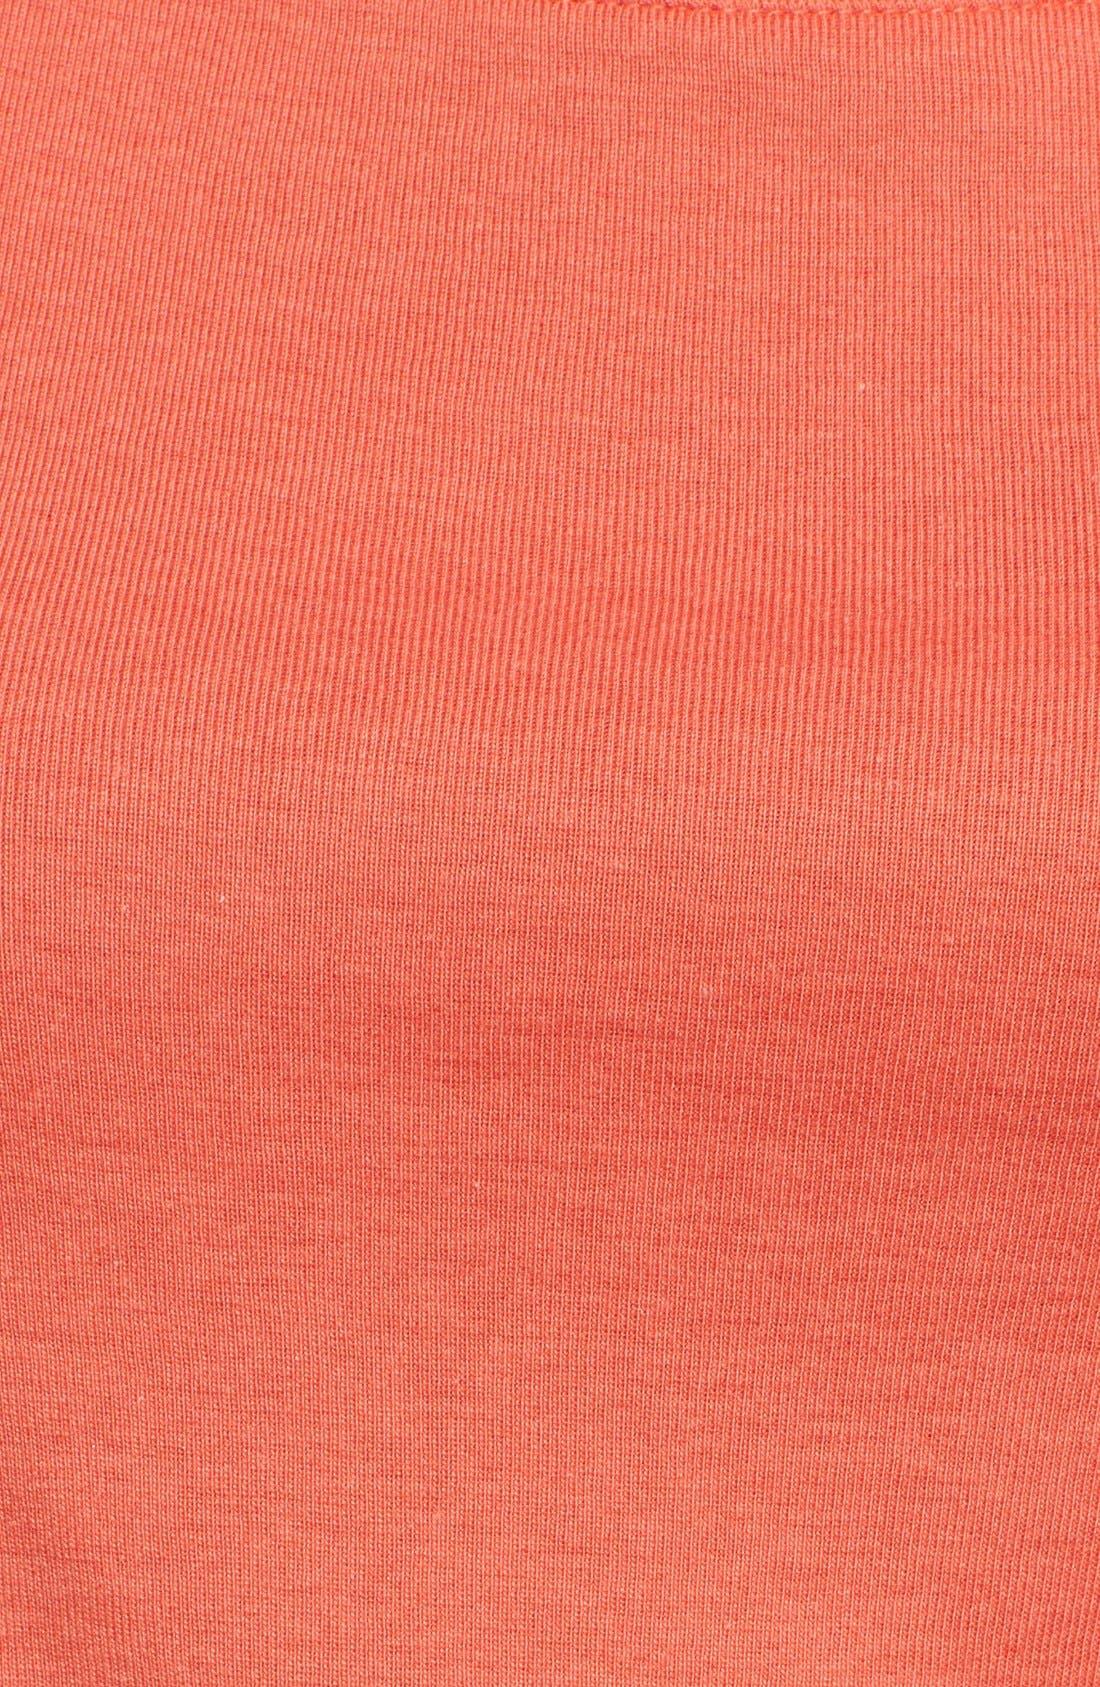 Ballet Neck Cotton & Modal Knit Elbow Sleeve Tee,                             Alternate thumbnail 164, color,